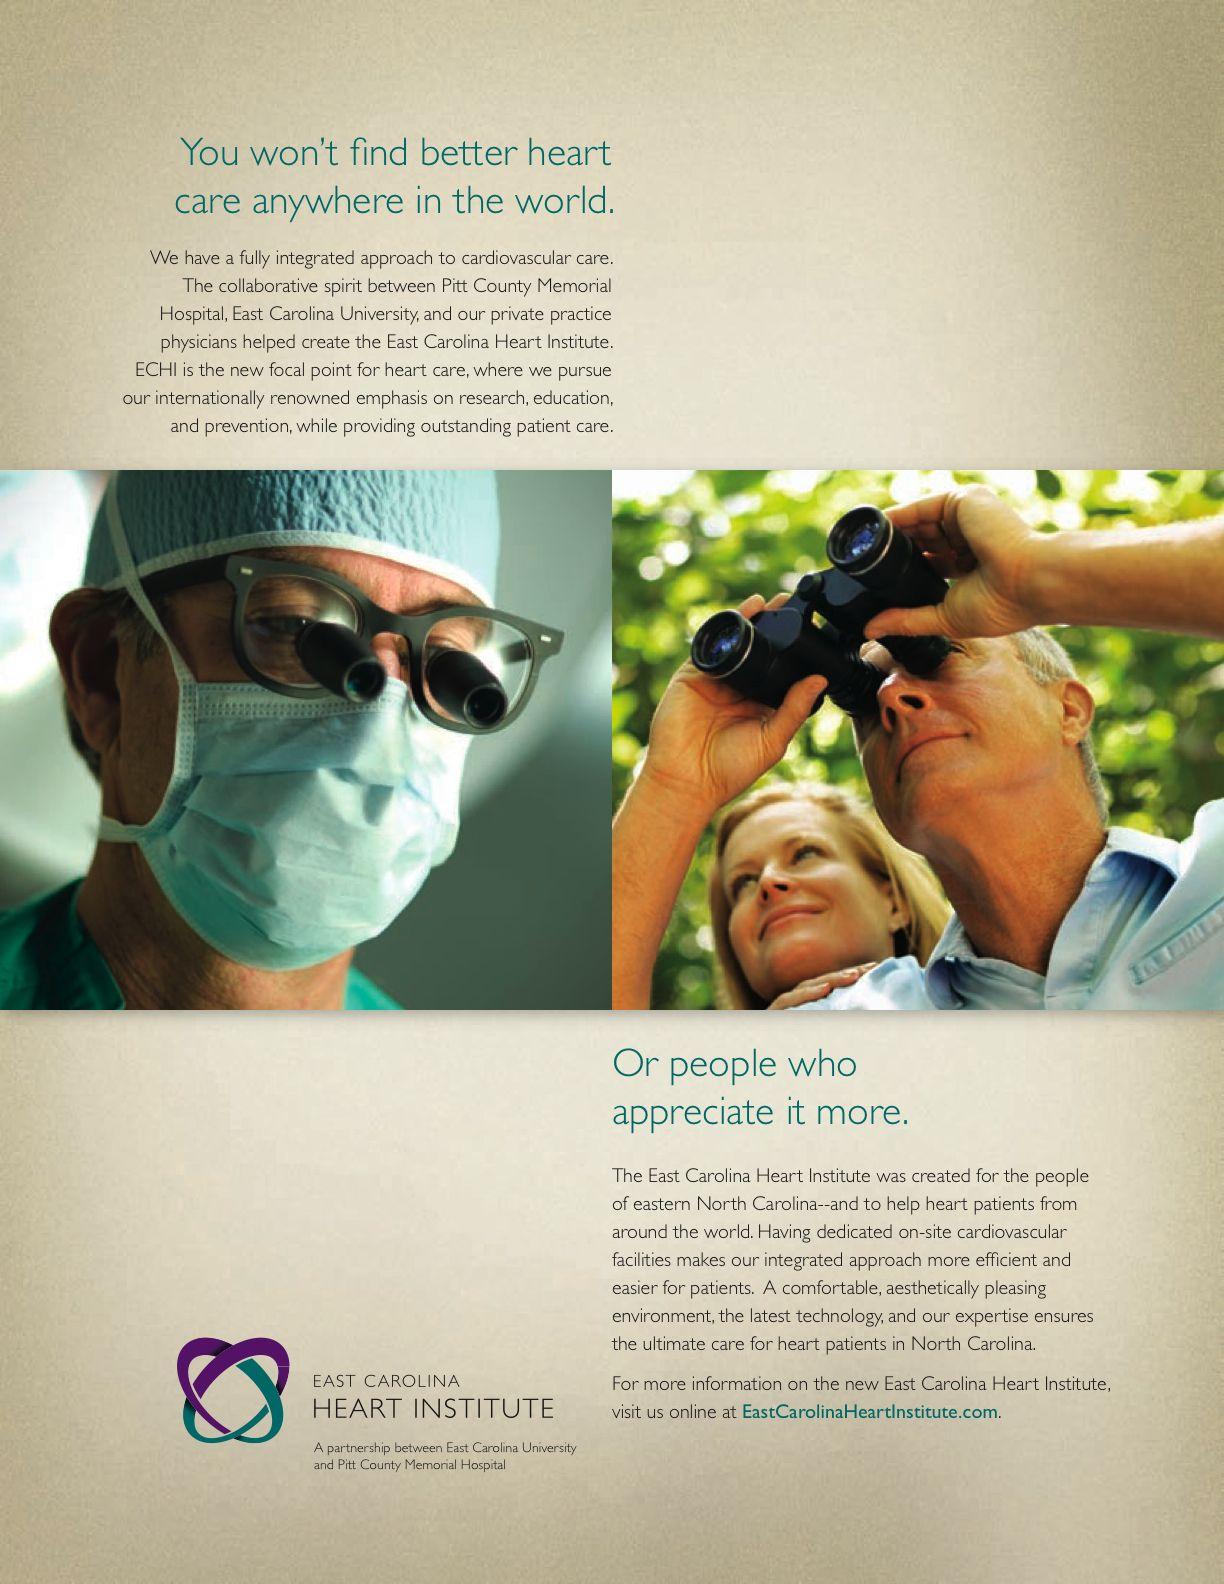 Mirror image ad campaign launches heart institute health